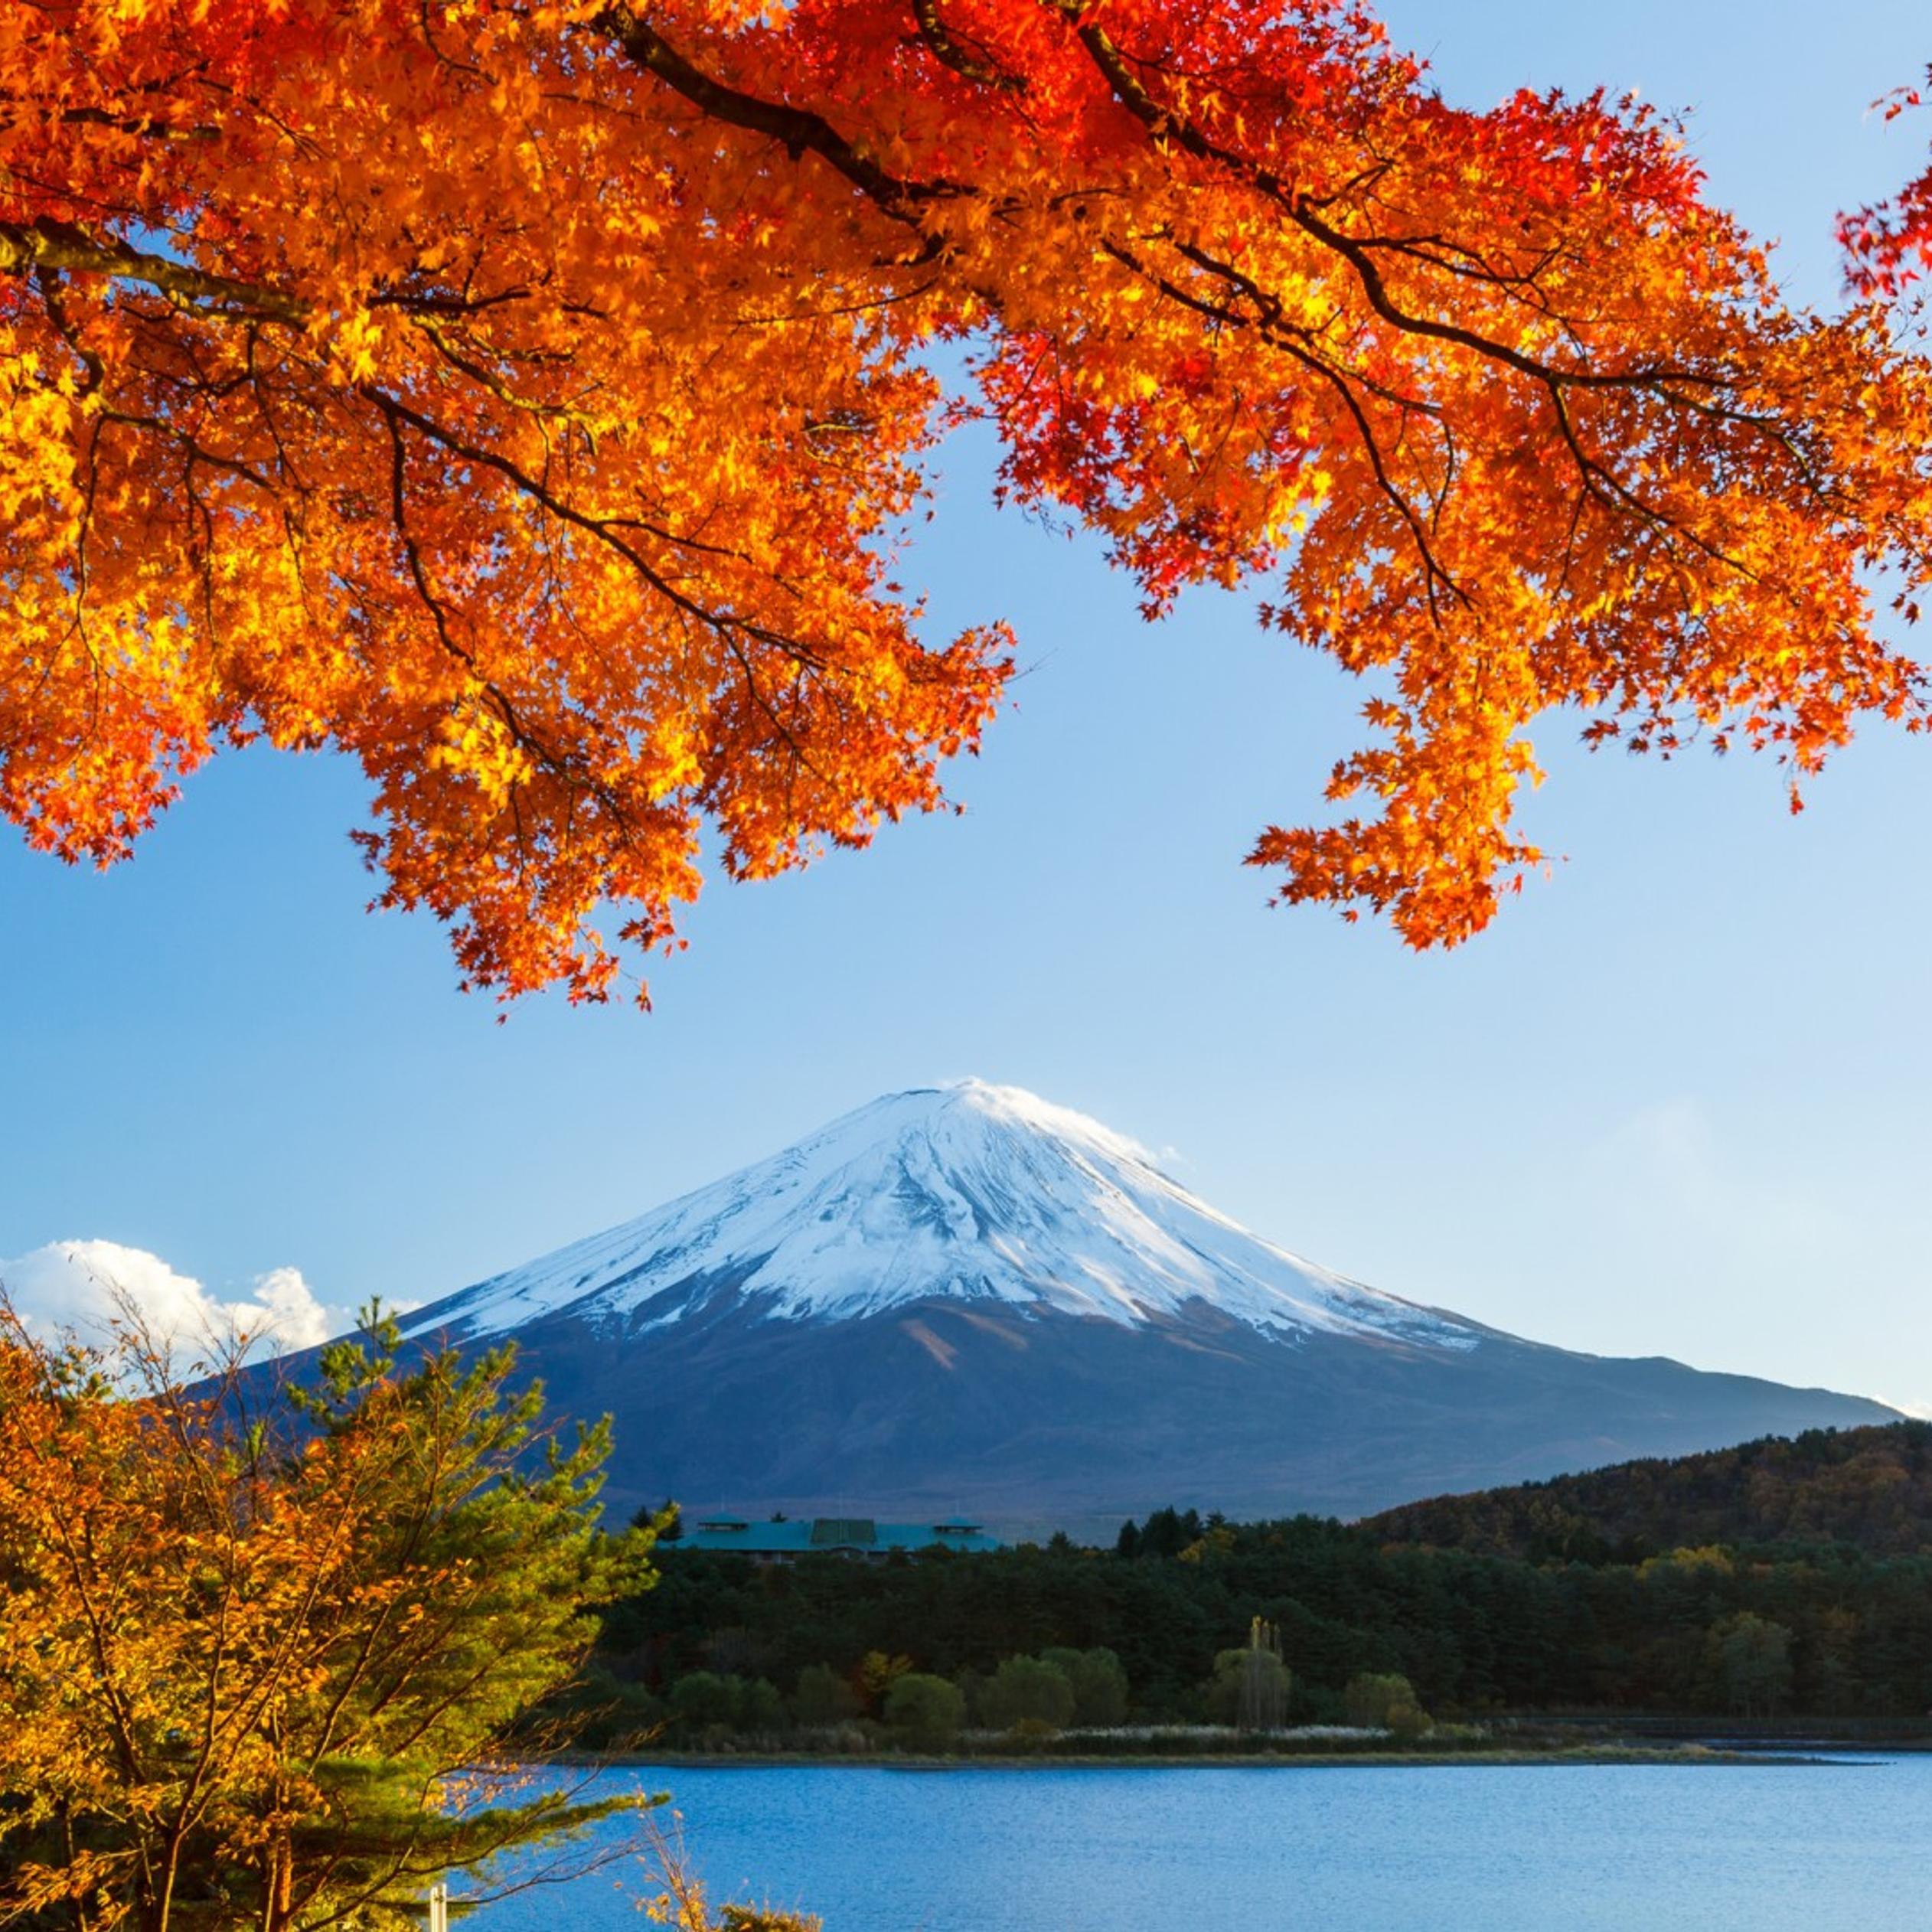 autumn trees winter mountain - hd wallpaper wallpaper download 2524x2524